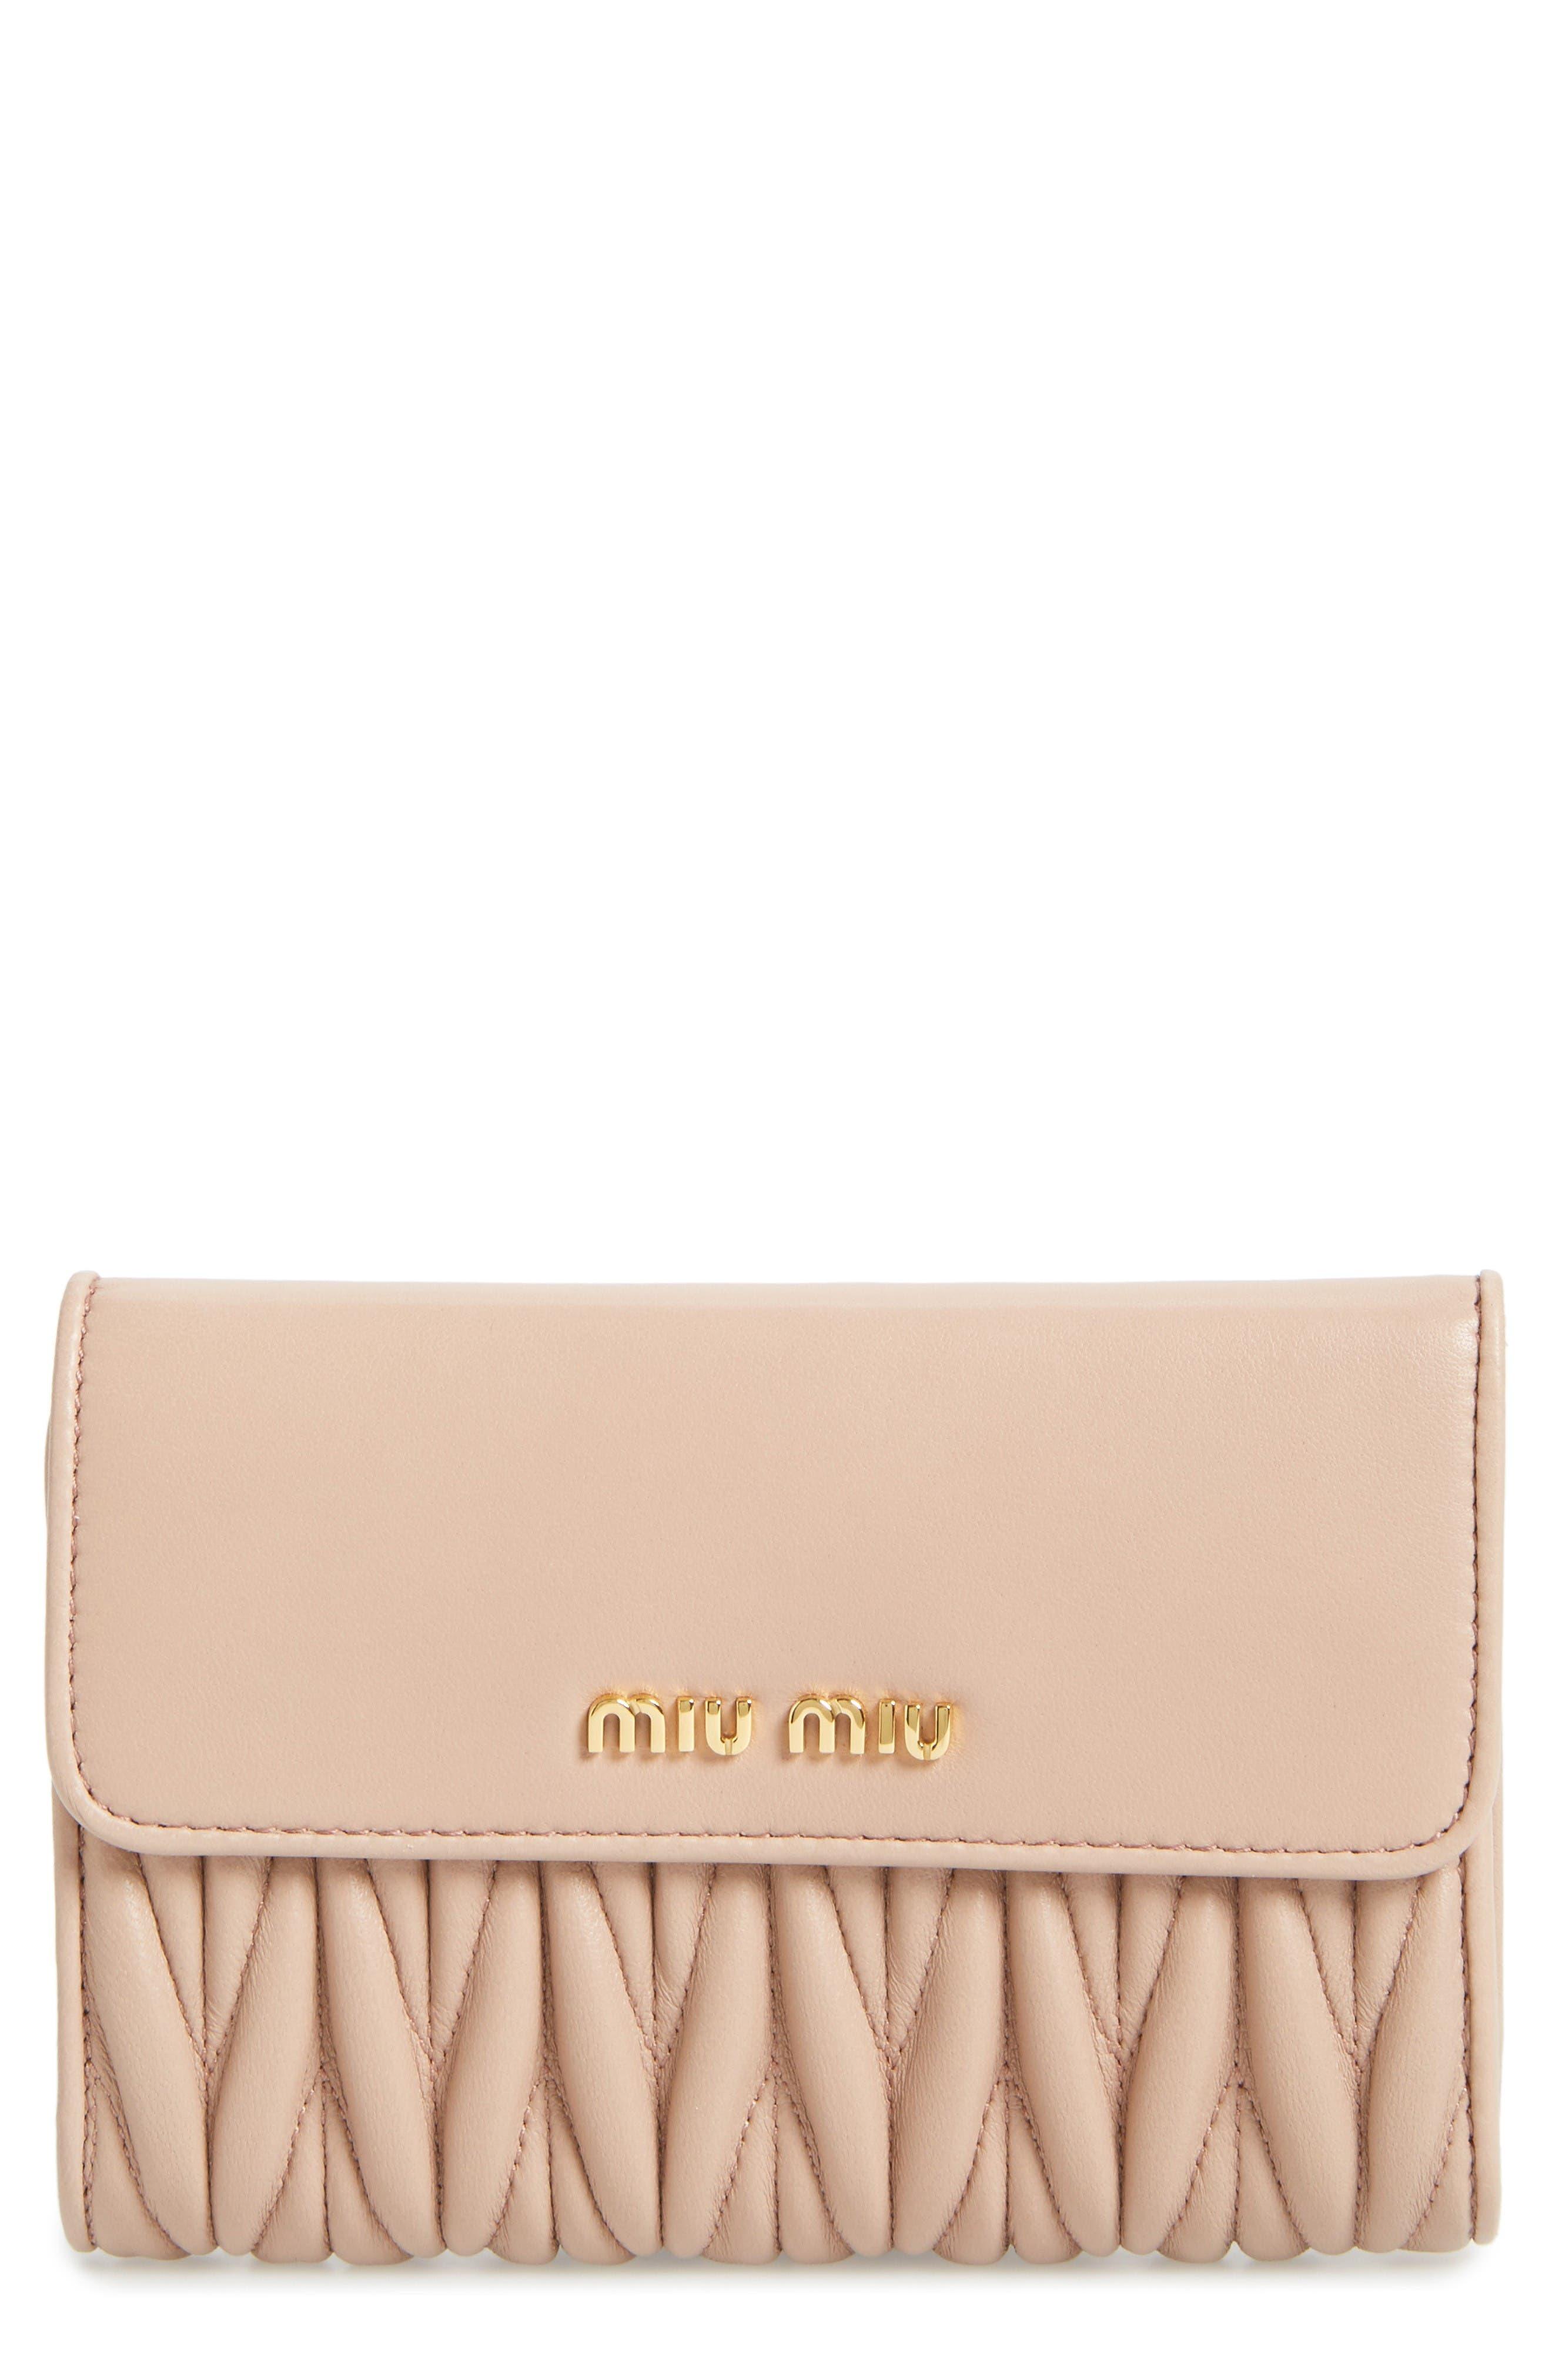 Main Image - Miu Miu Matelassé Leather French Wallet